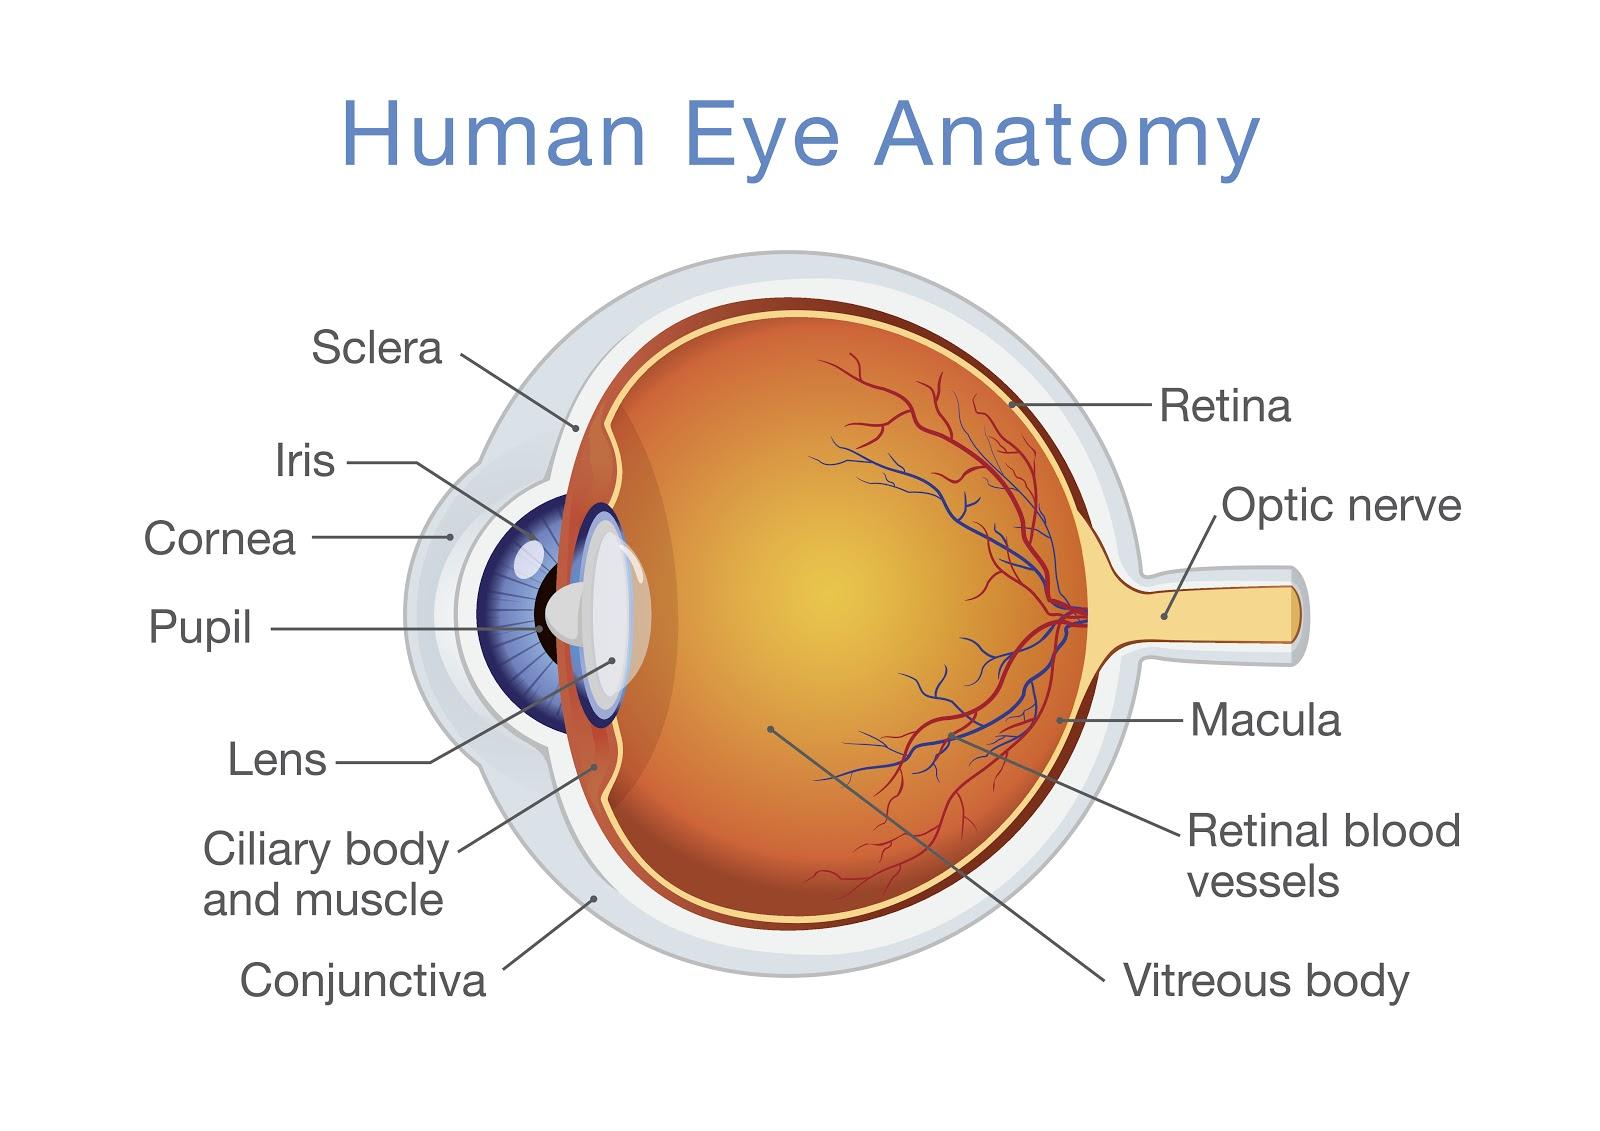 Human eye anatomy diagram